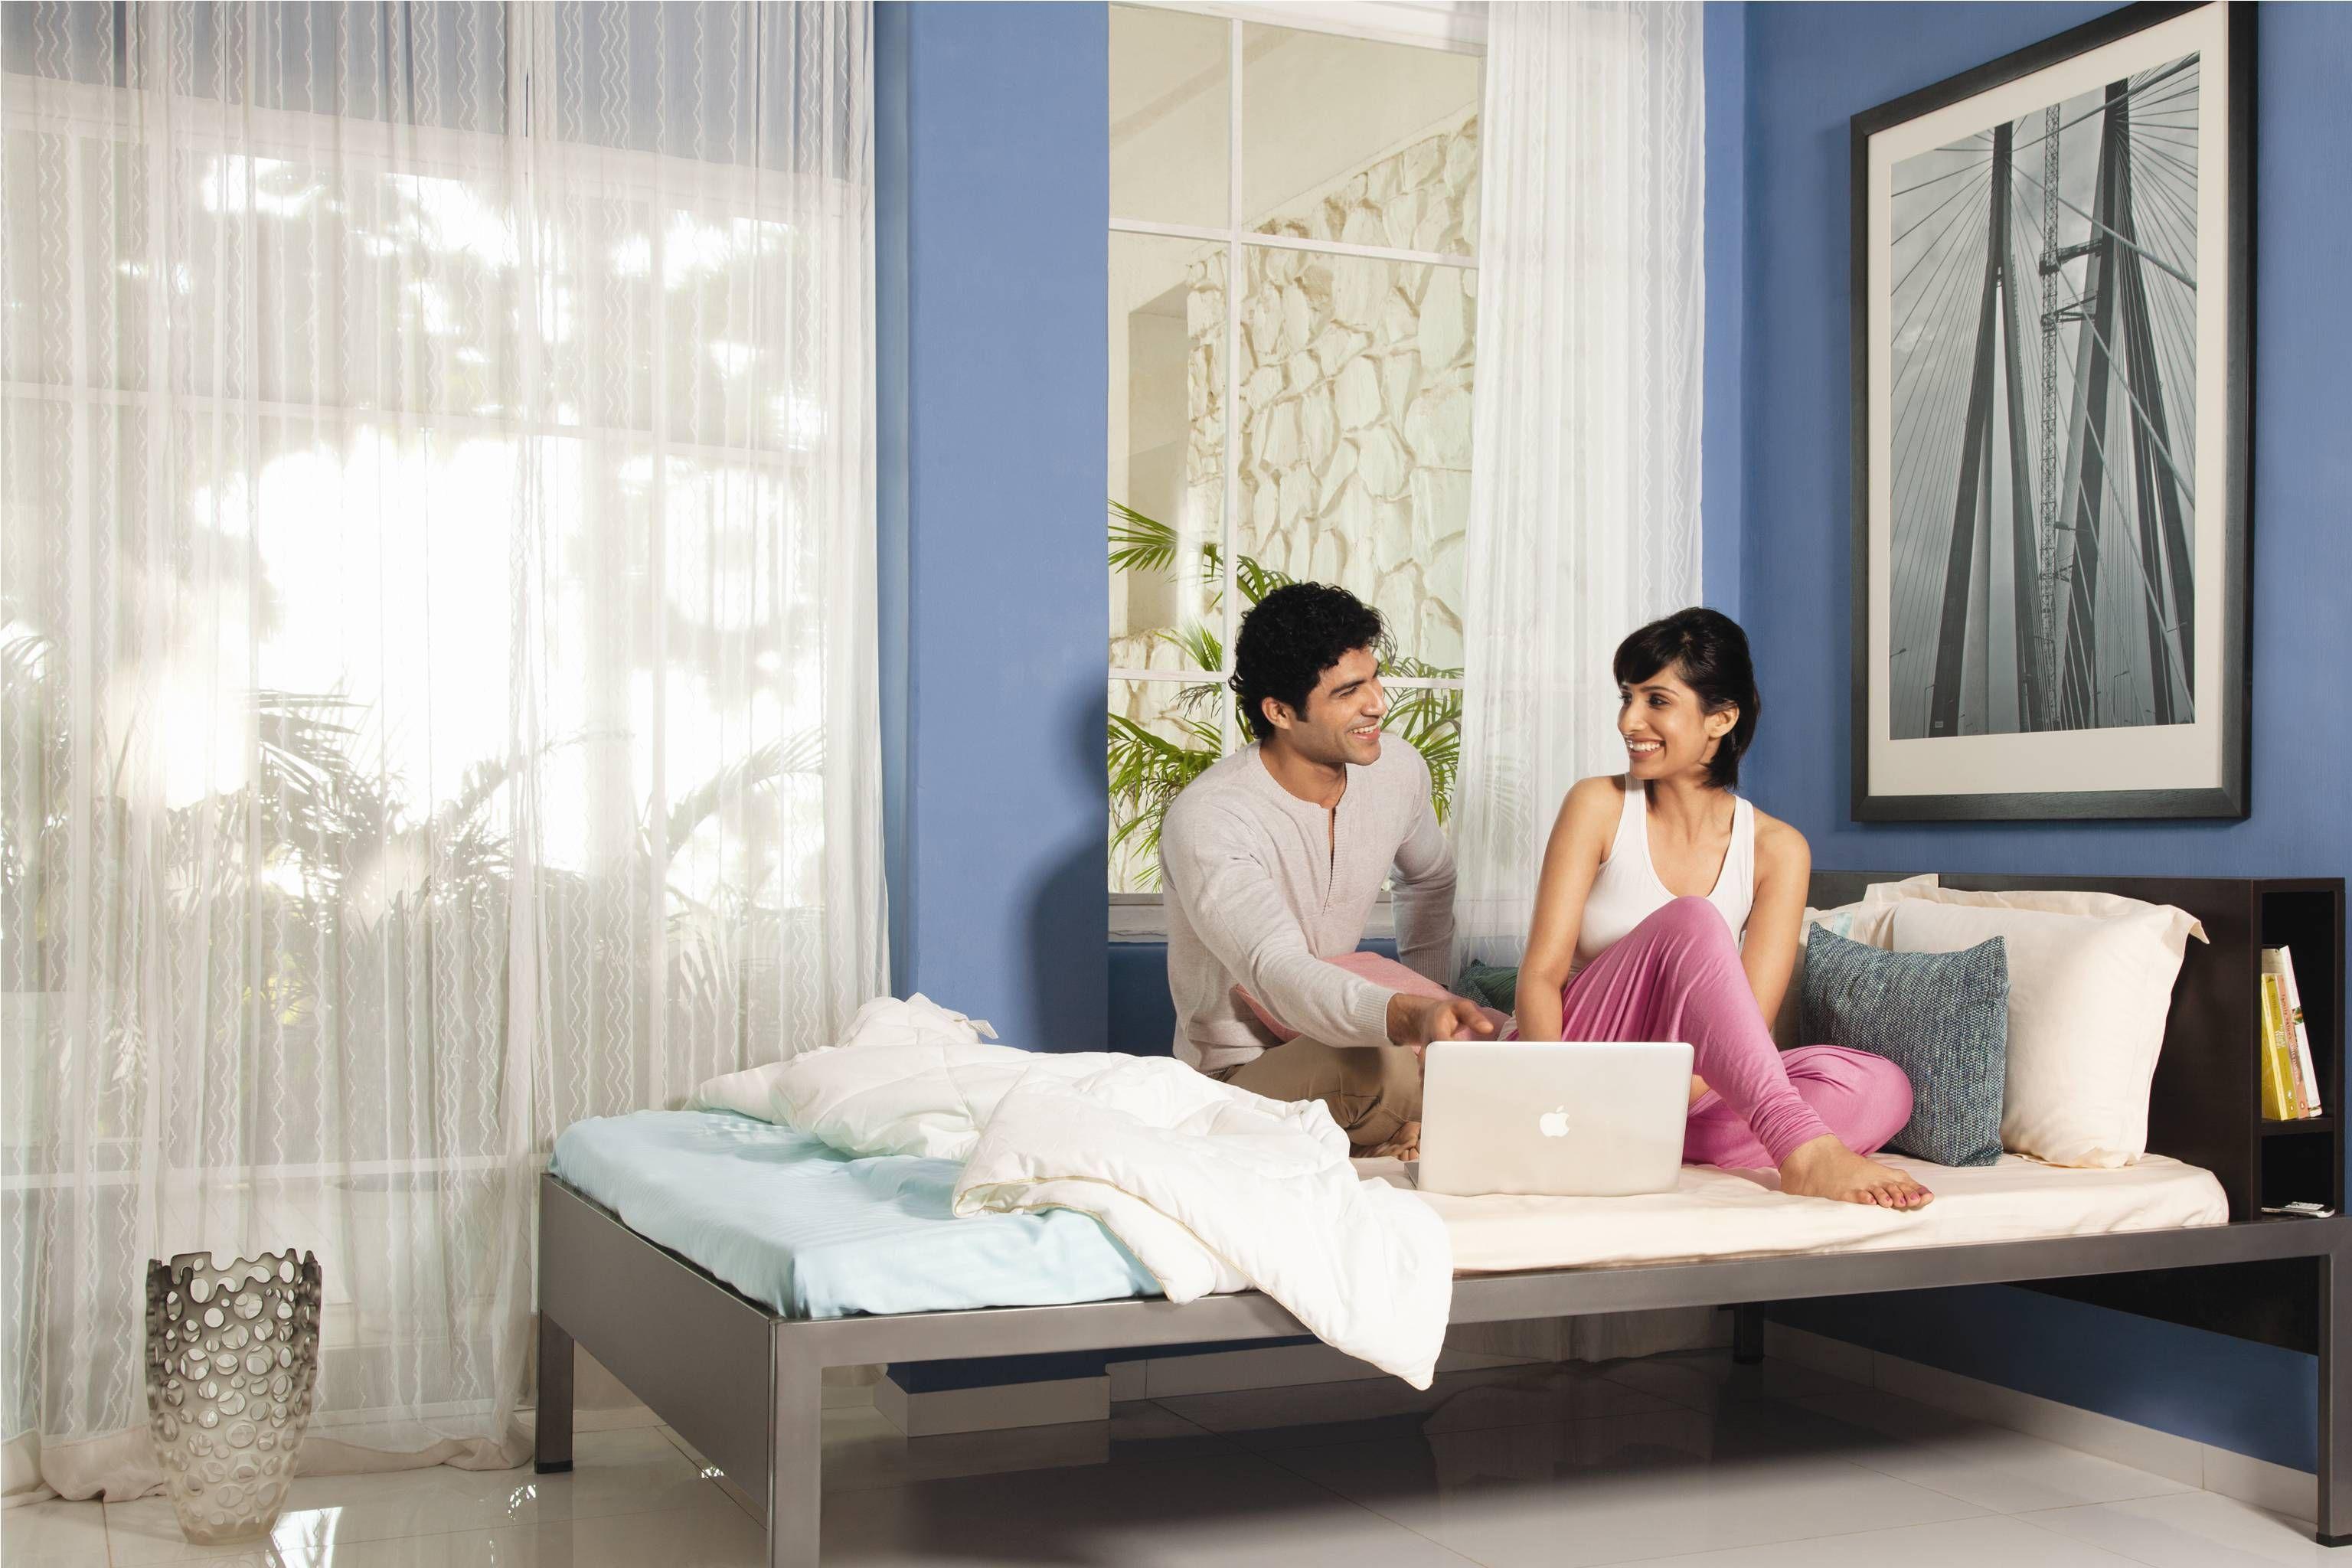 Godrej Interio Beds For A Comfortable Living Home Furniture Online Home Furniture